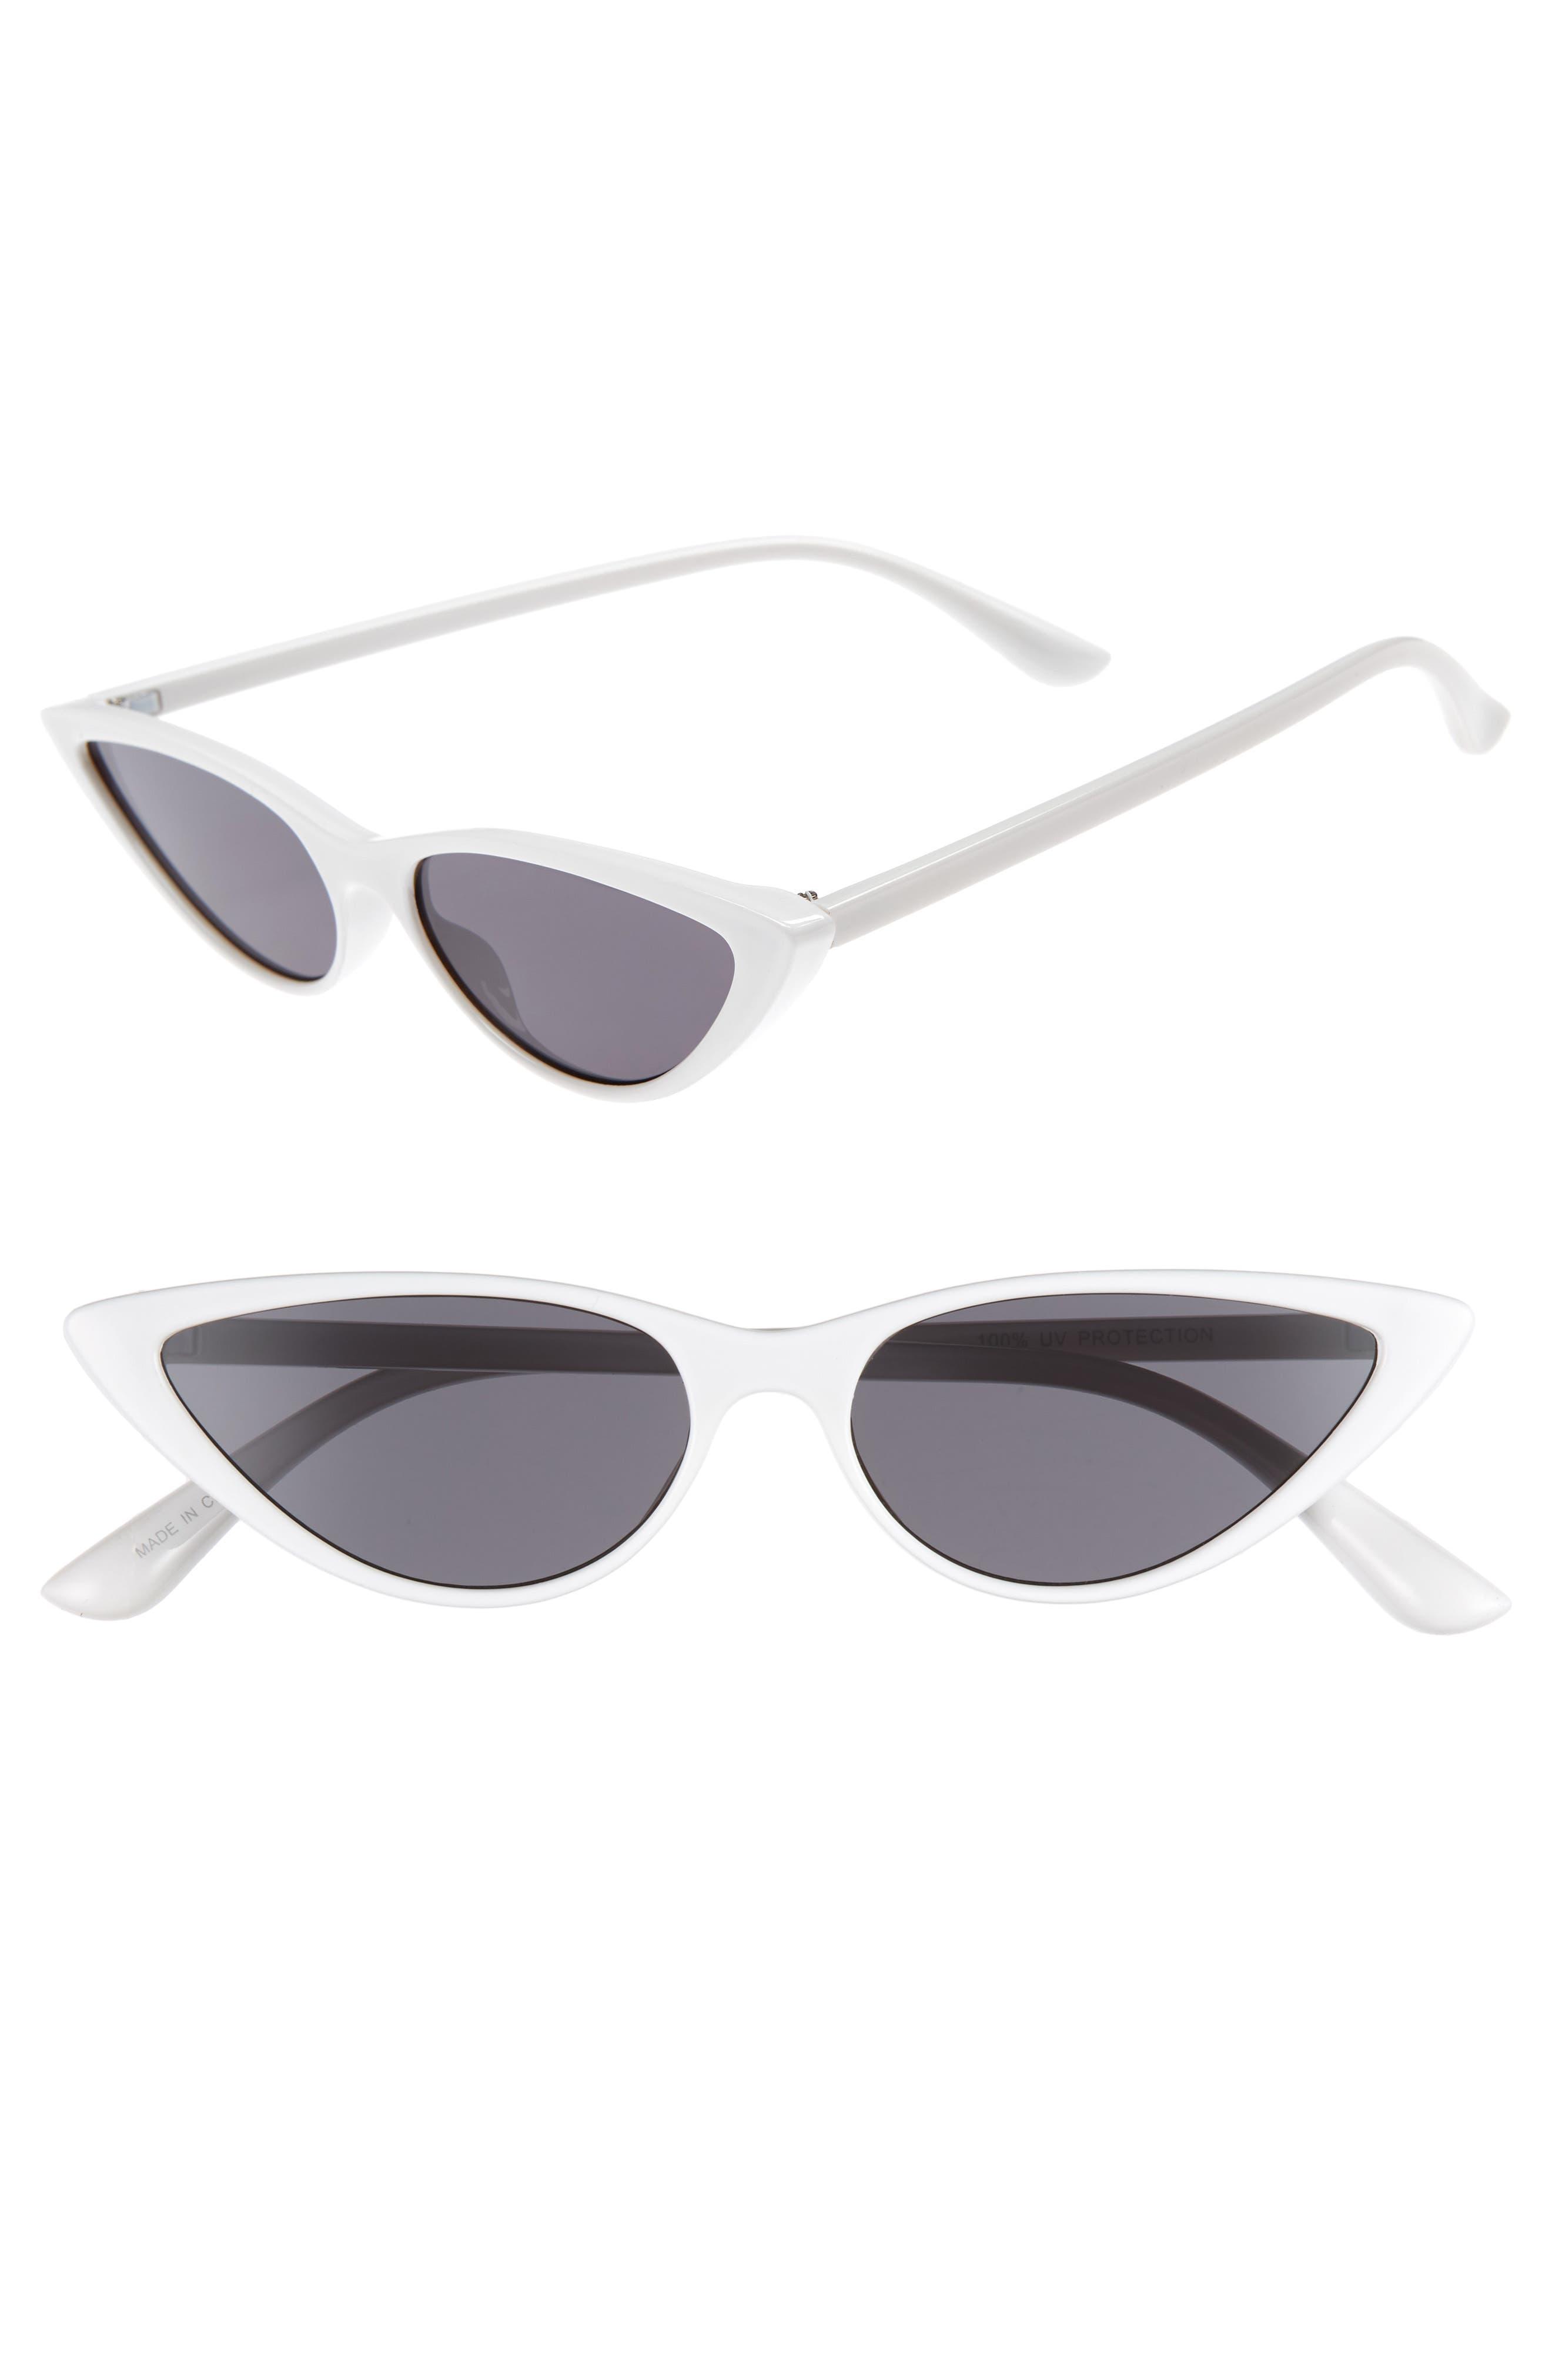 55mm Cat Eye Sunglasses,                         Main,                         color, WHITE